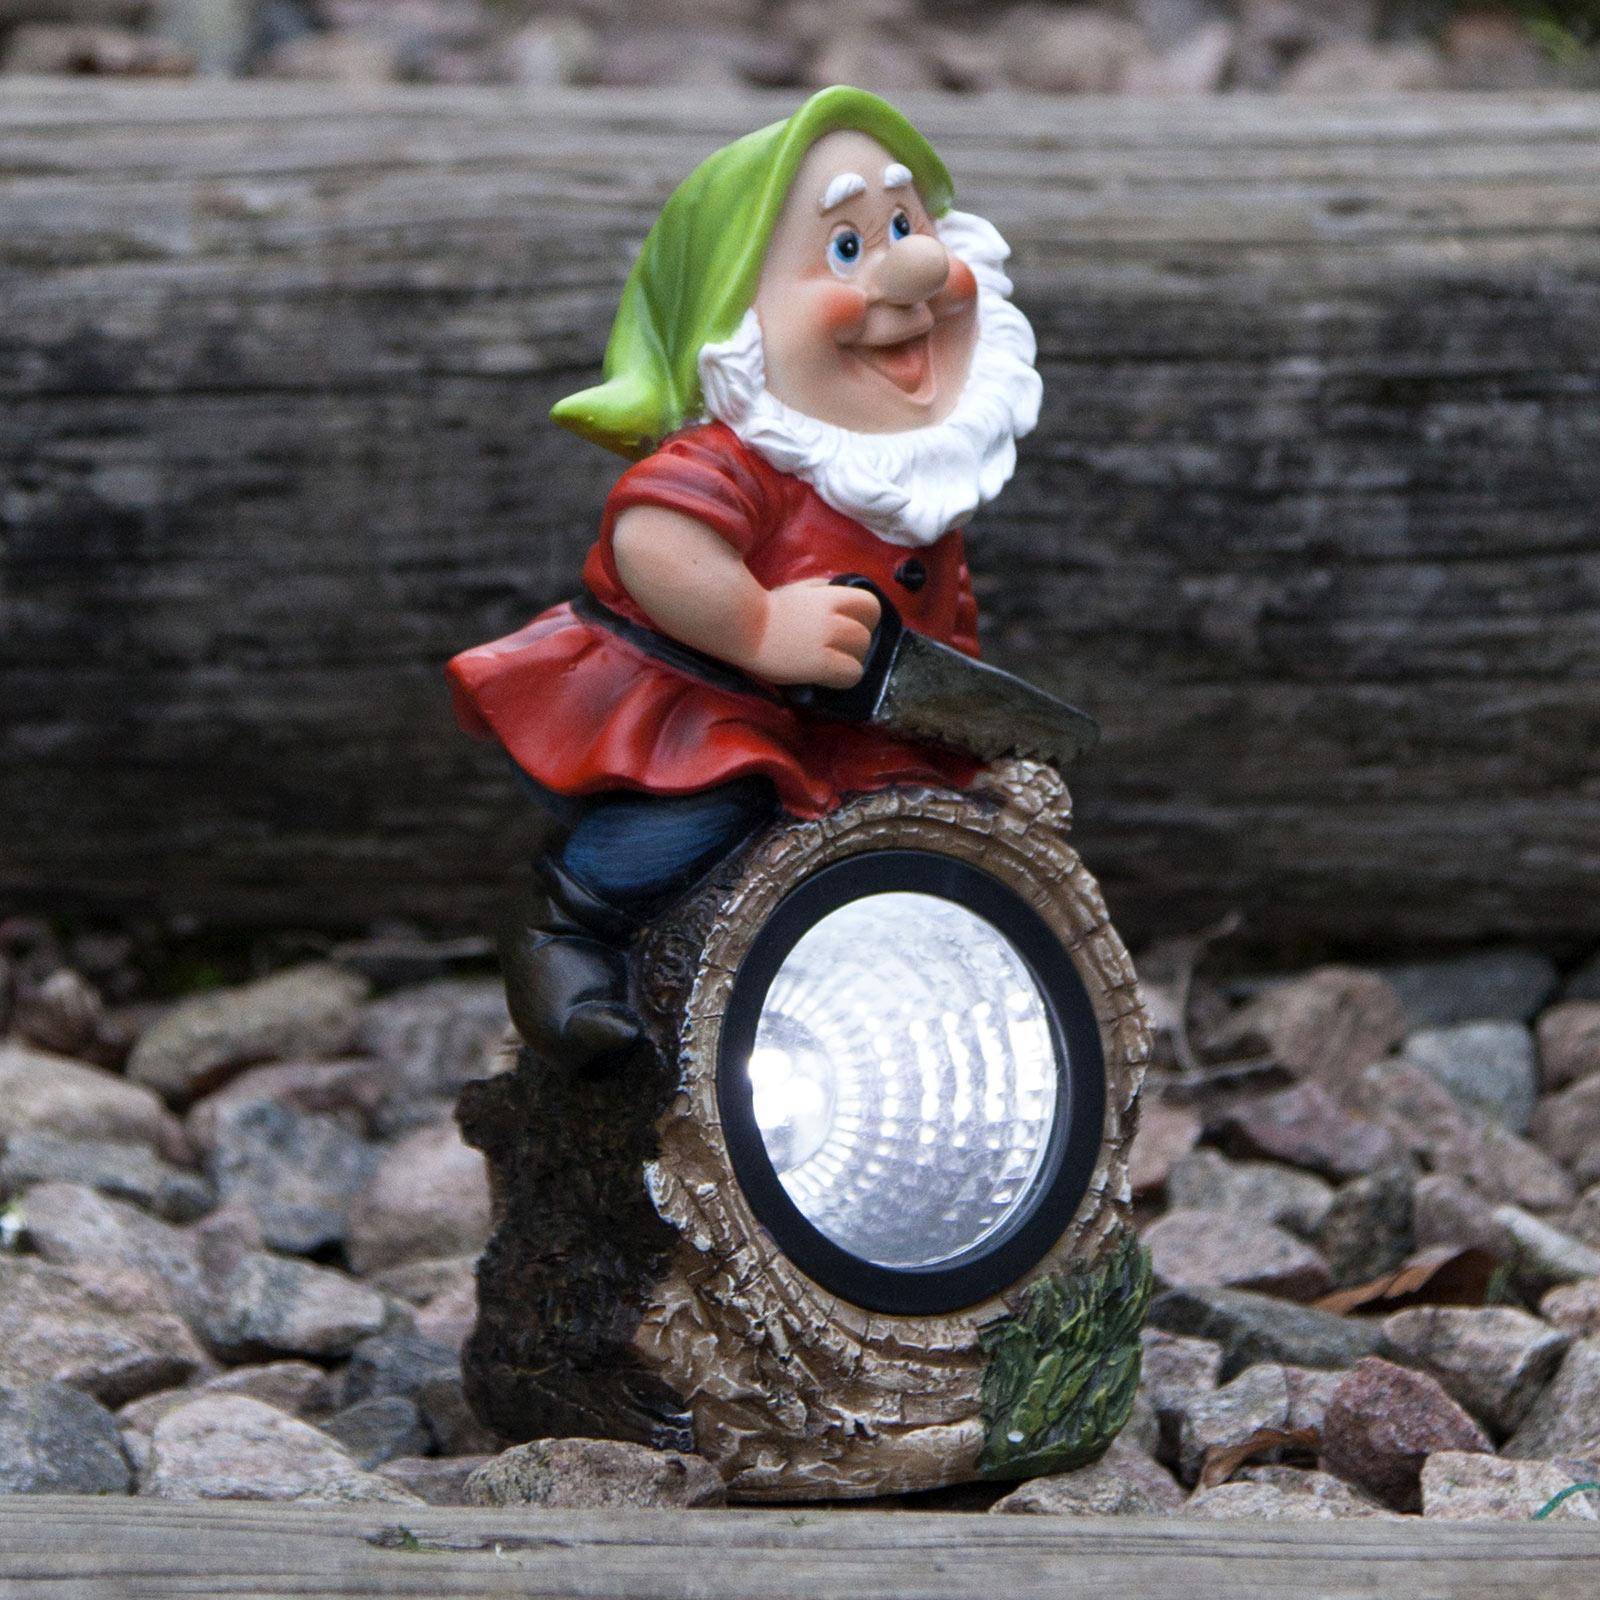 LED-solcellslampa Gnomy, skogshuggare